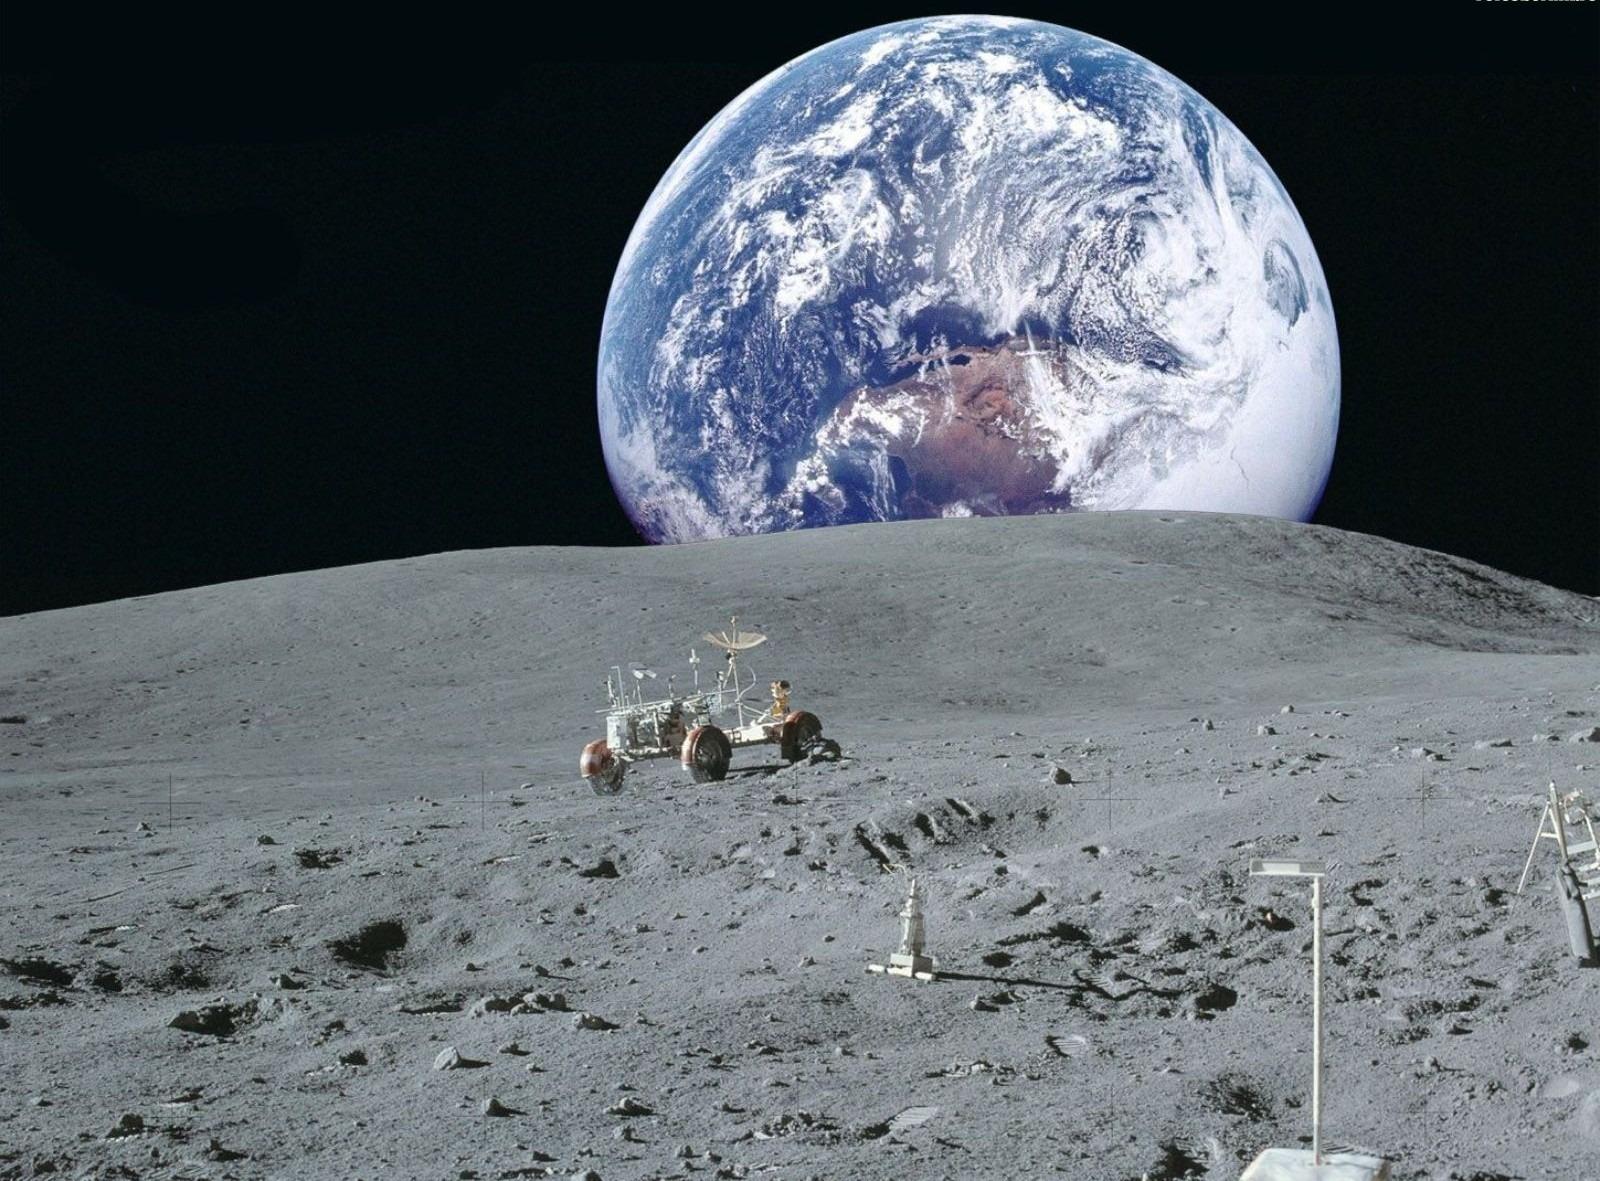 earth from the moon the moon nasa earth planet moon car wallpaperjpg 1600x1181